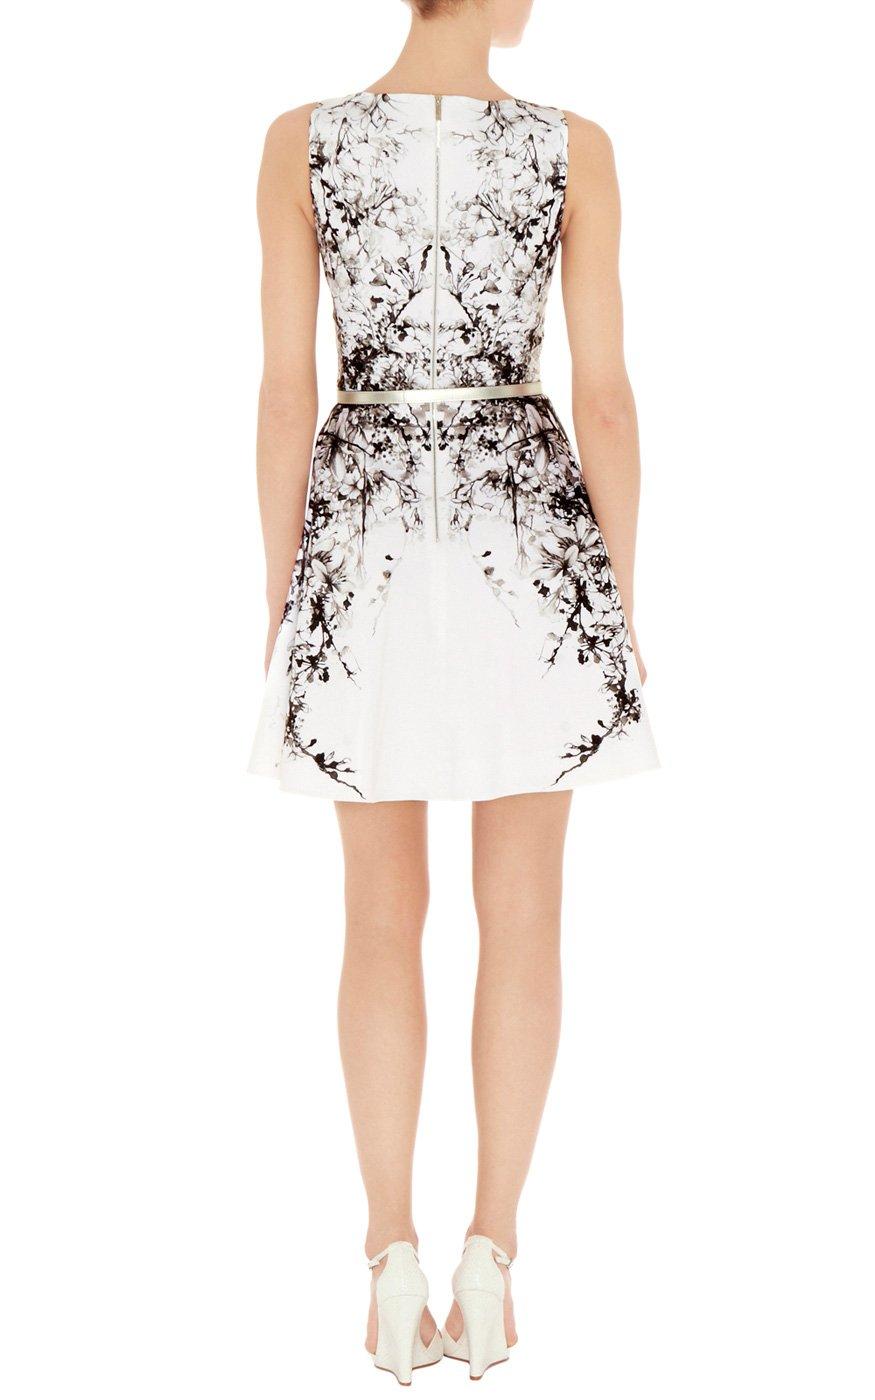 Lyst - Karen Millen Oriental Print Prom Dress in Black